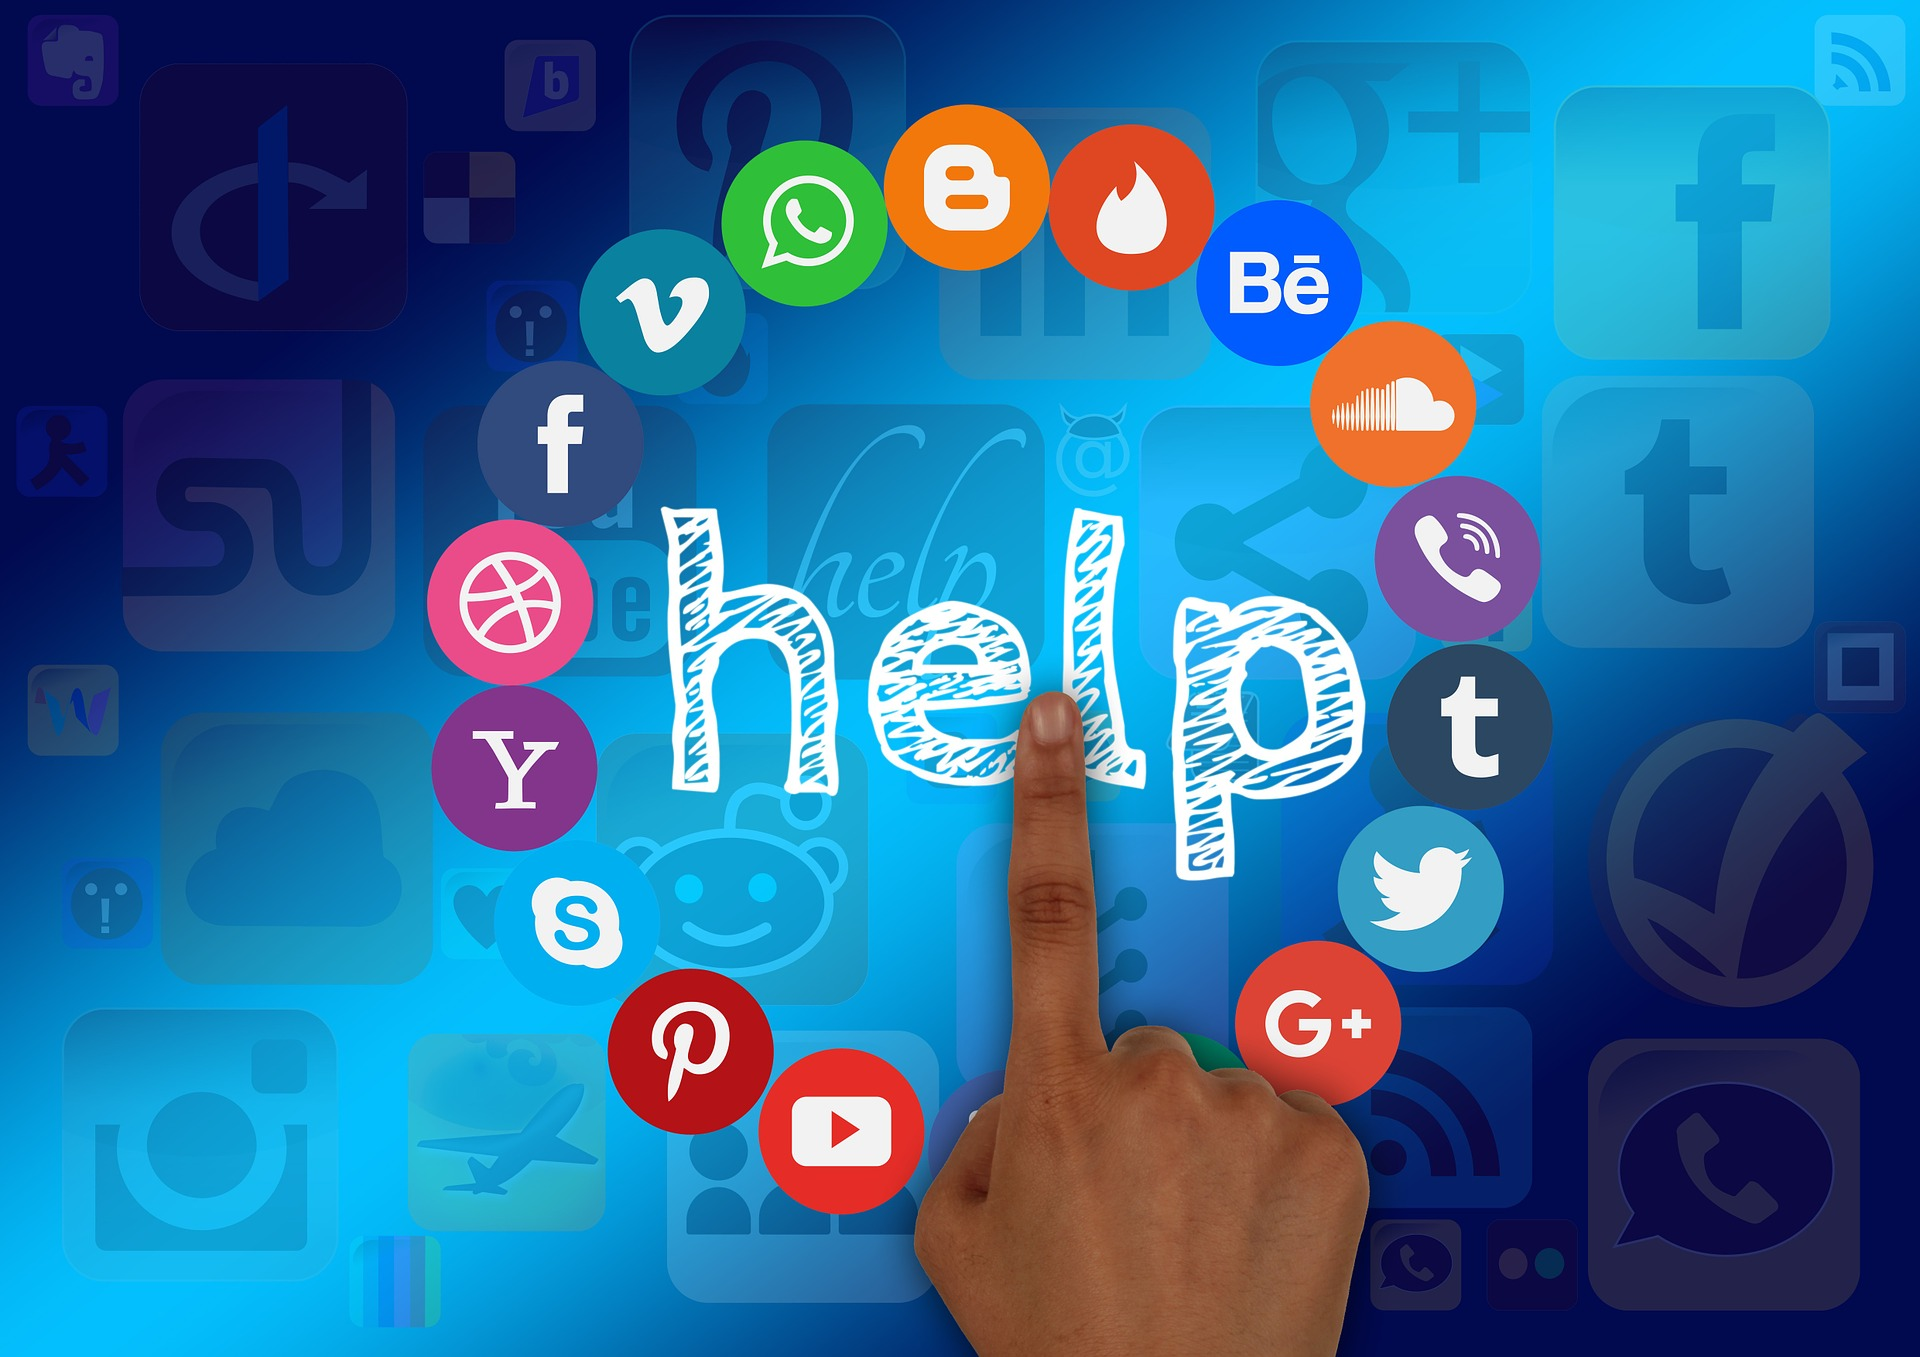 social media 1432937 1920 - WordPressをインストールする方法!xserver利用が初心者には簡単なのでおすすめ